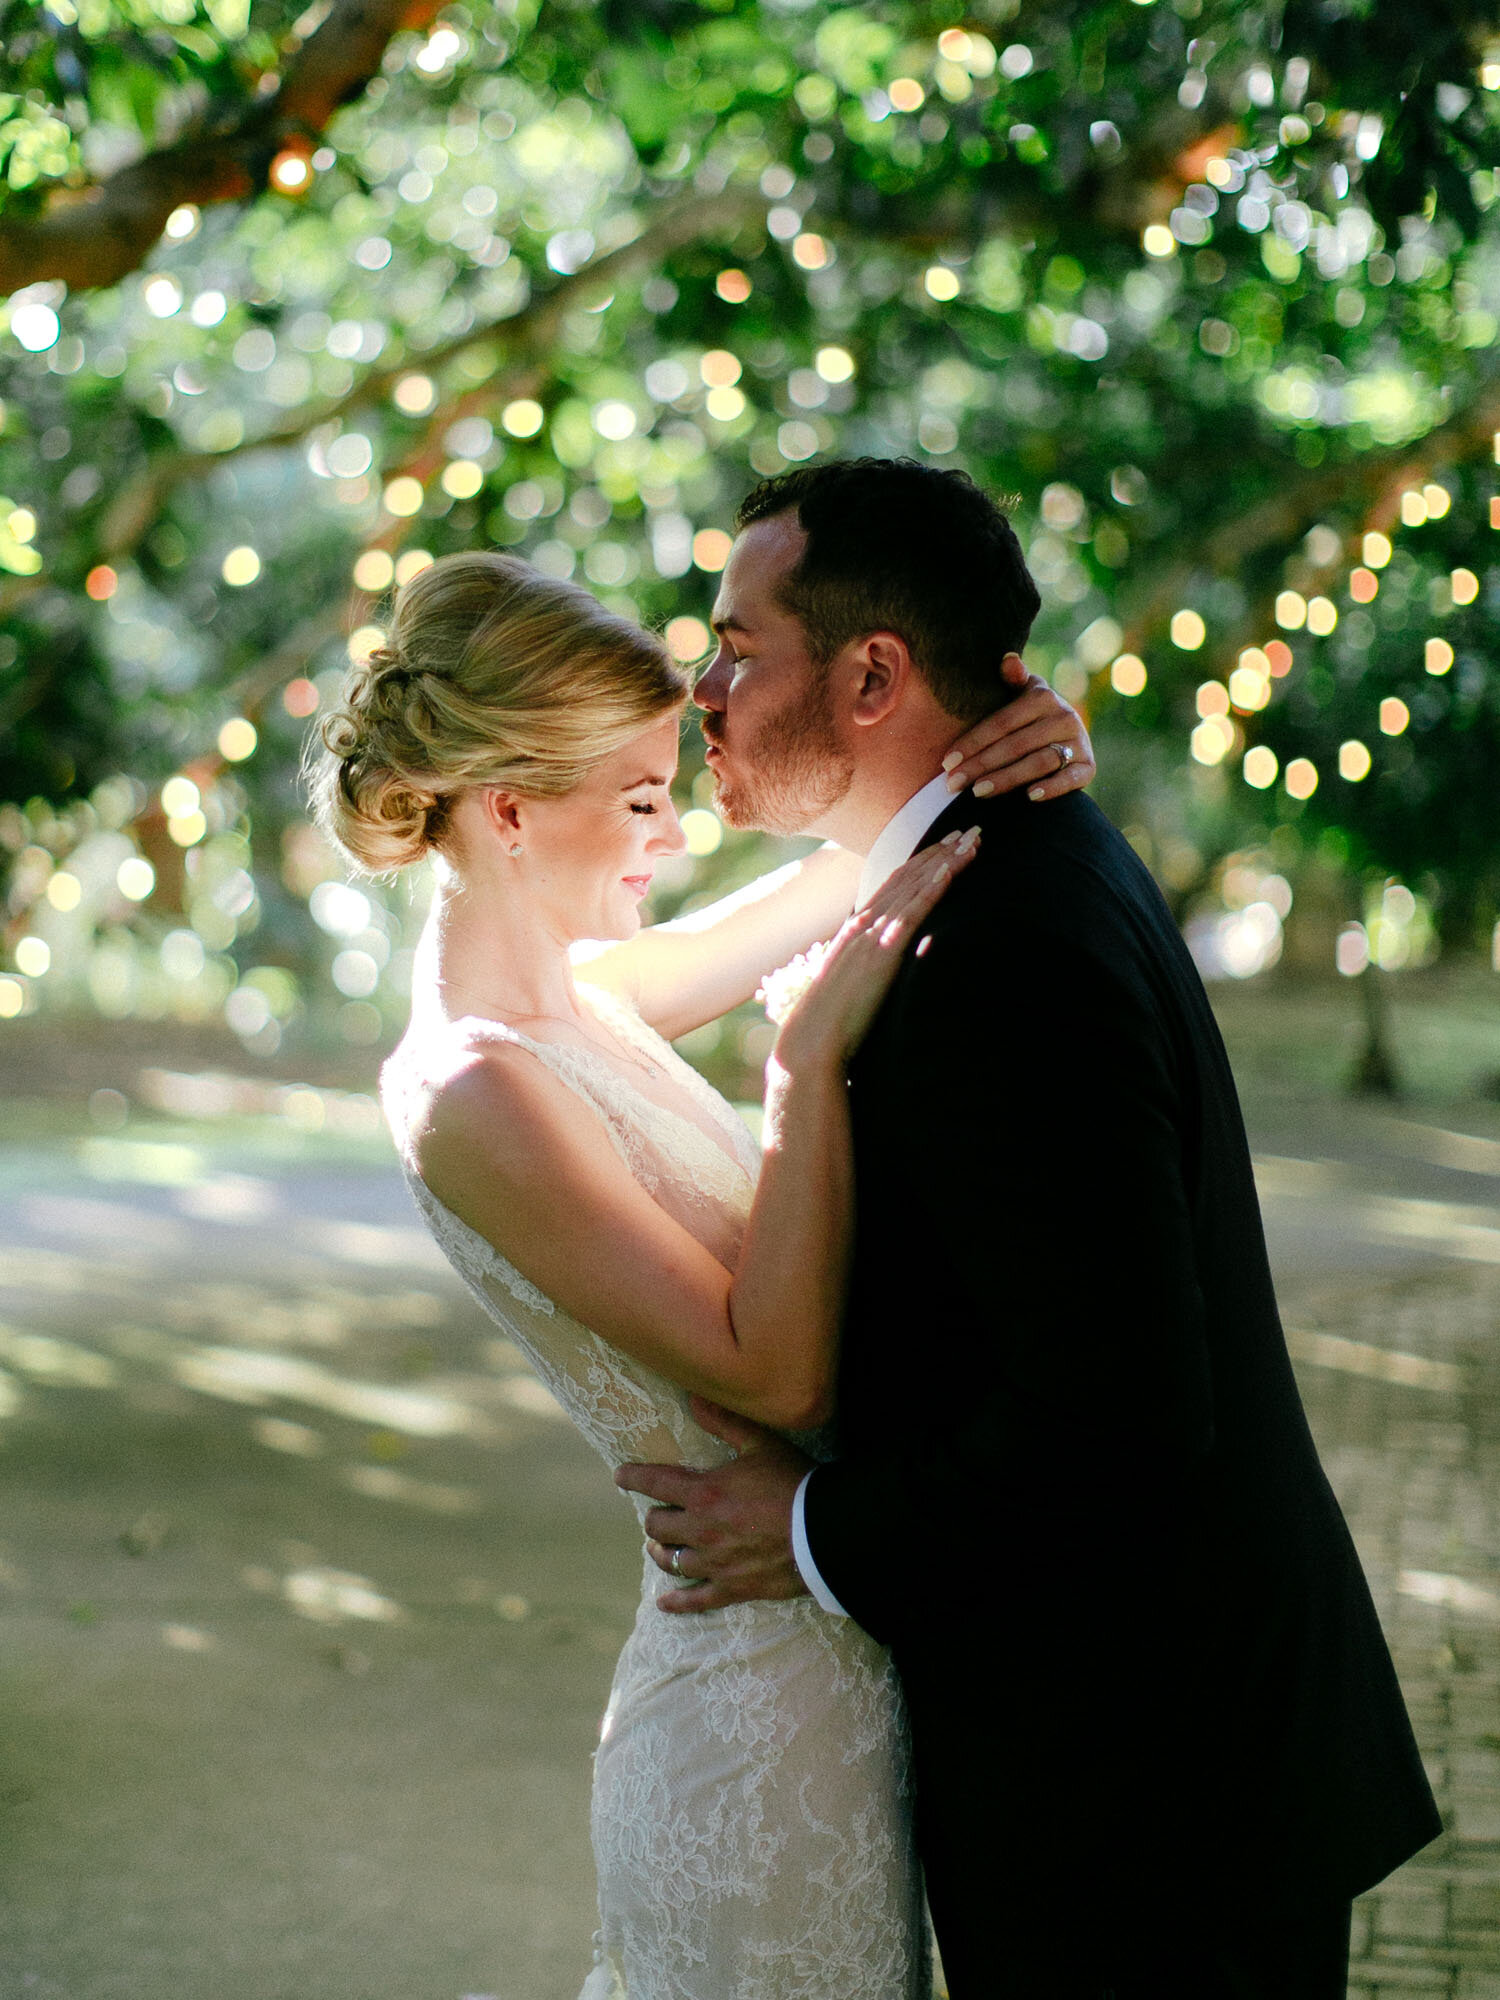 Chris-J-Evans-Maui-Wedding-Kim&Brian3985.jpg